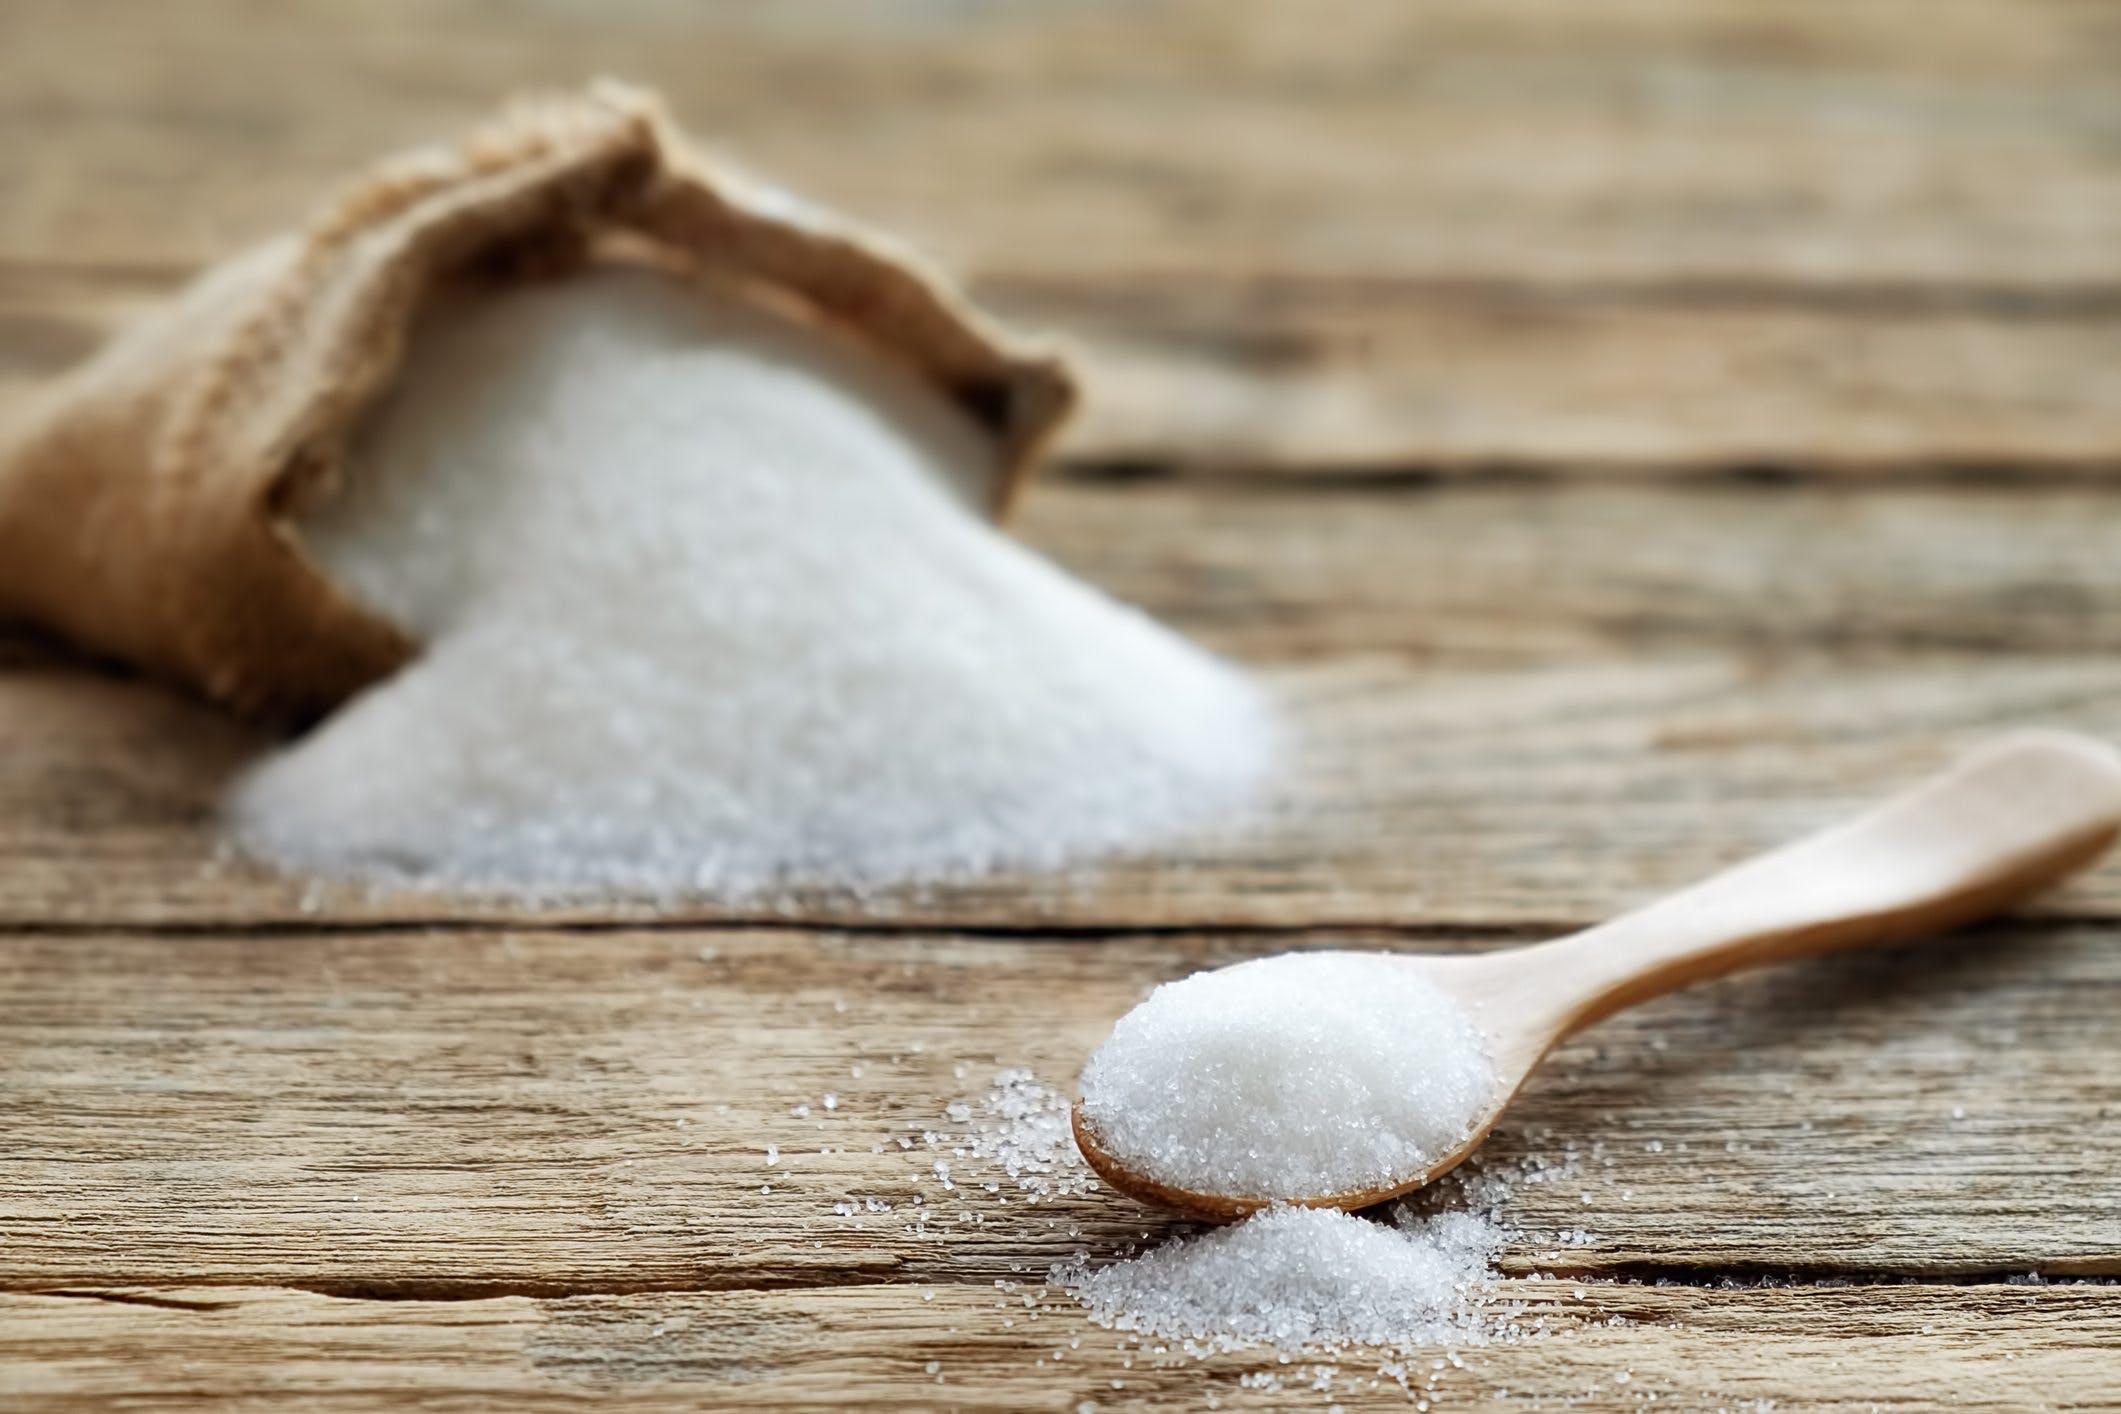 Sugar in burlap sack with sugarcane